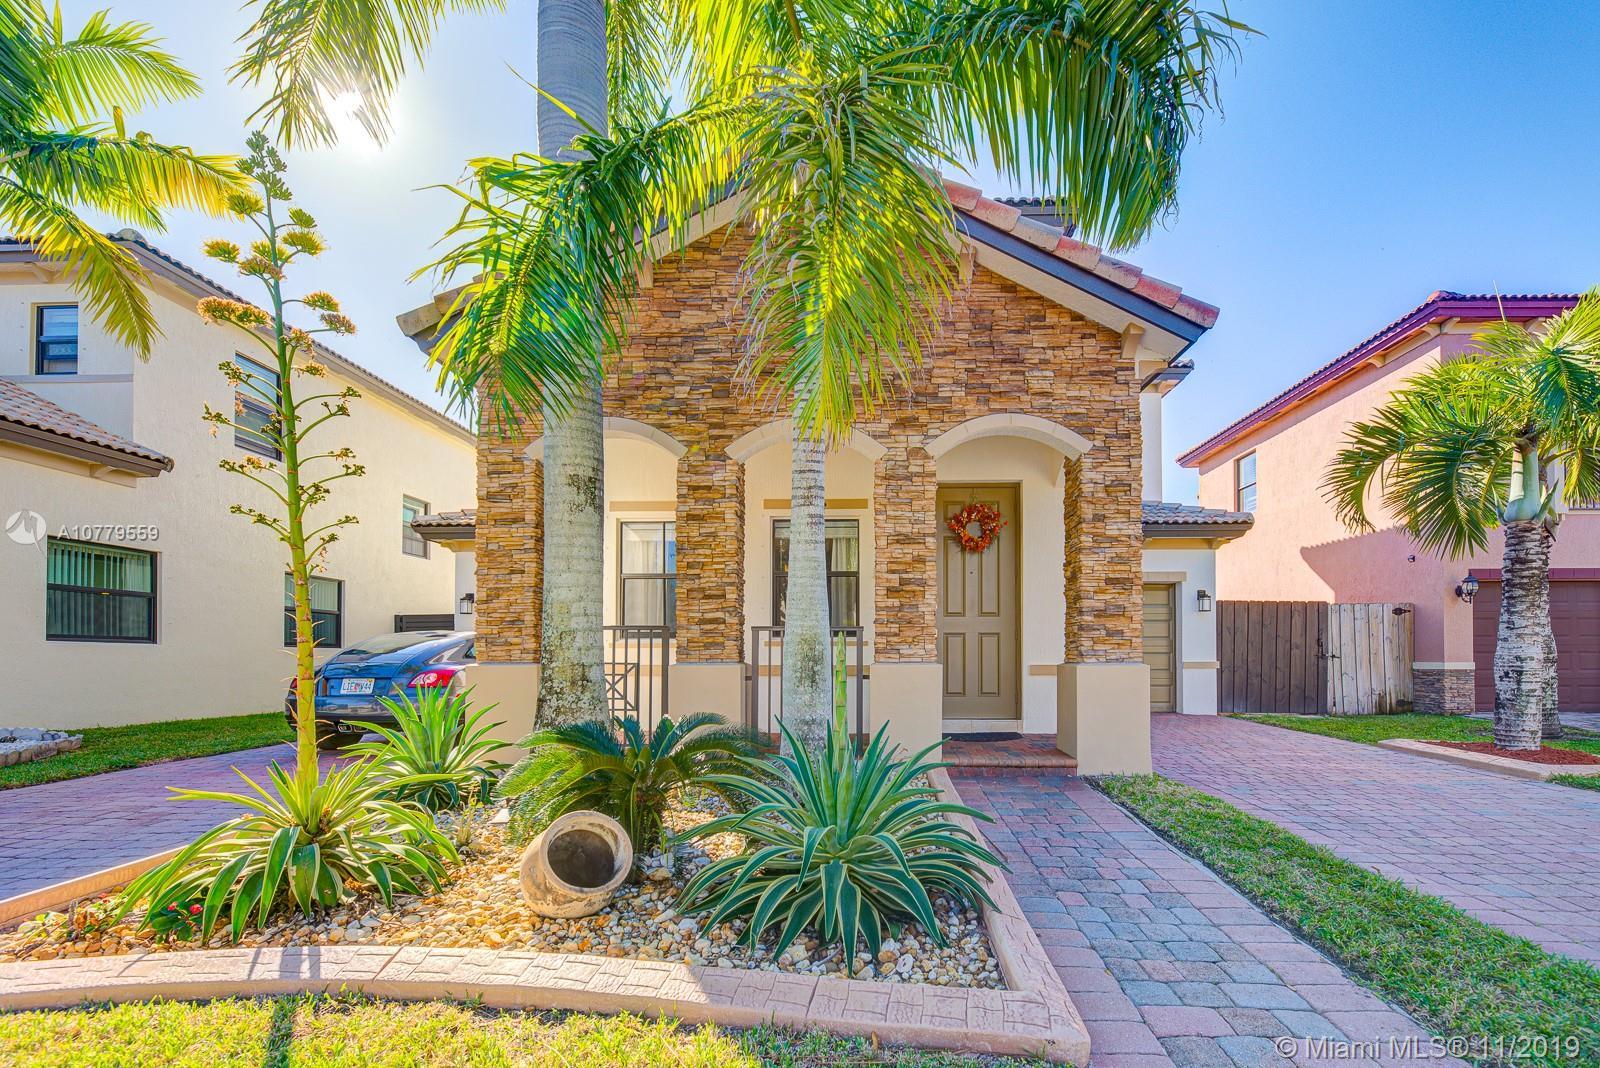 11352 SW 243rd Ter, Homestead, FL 33032 - Homestead, FL real estate listing